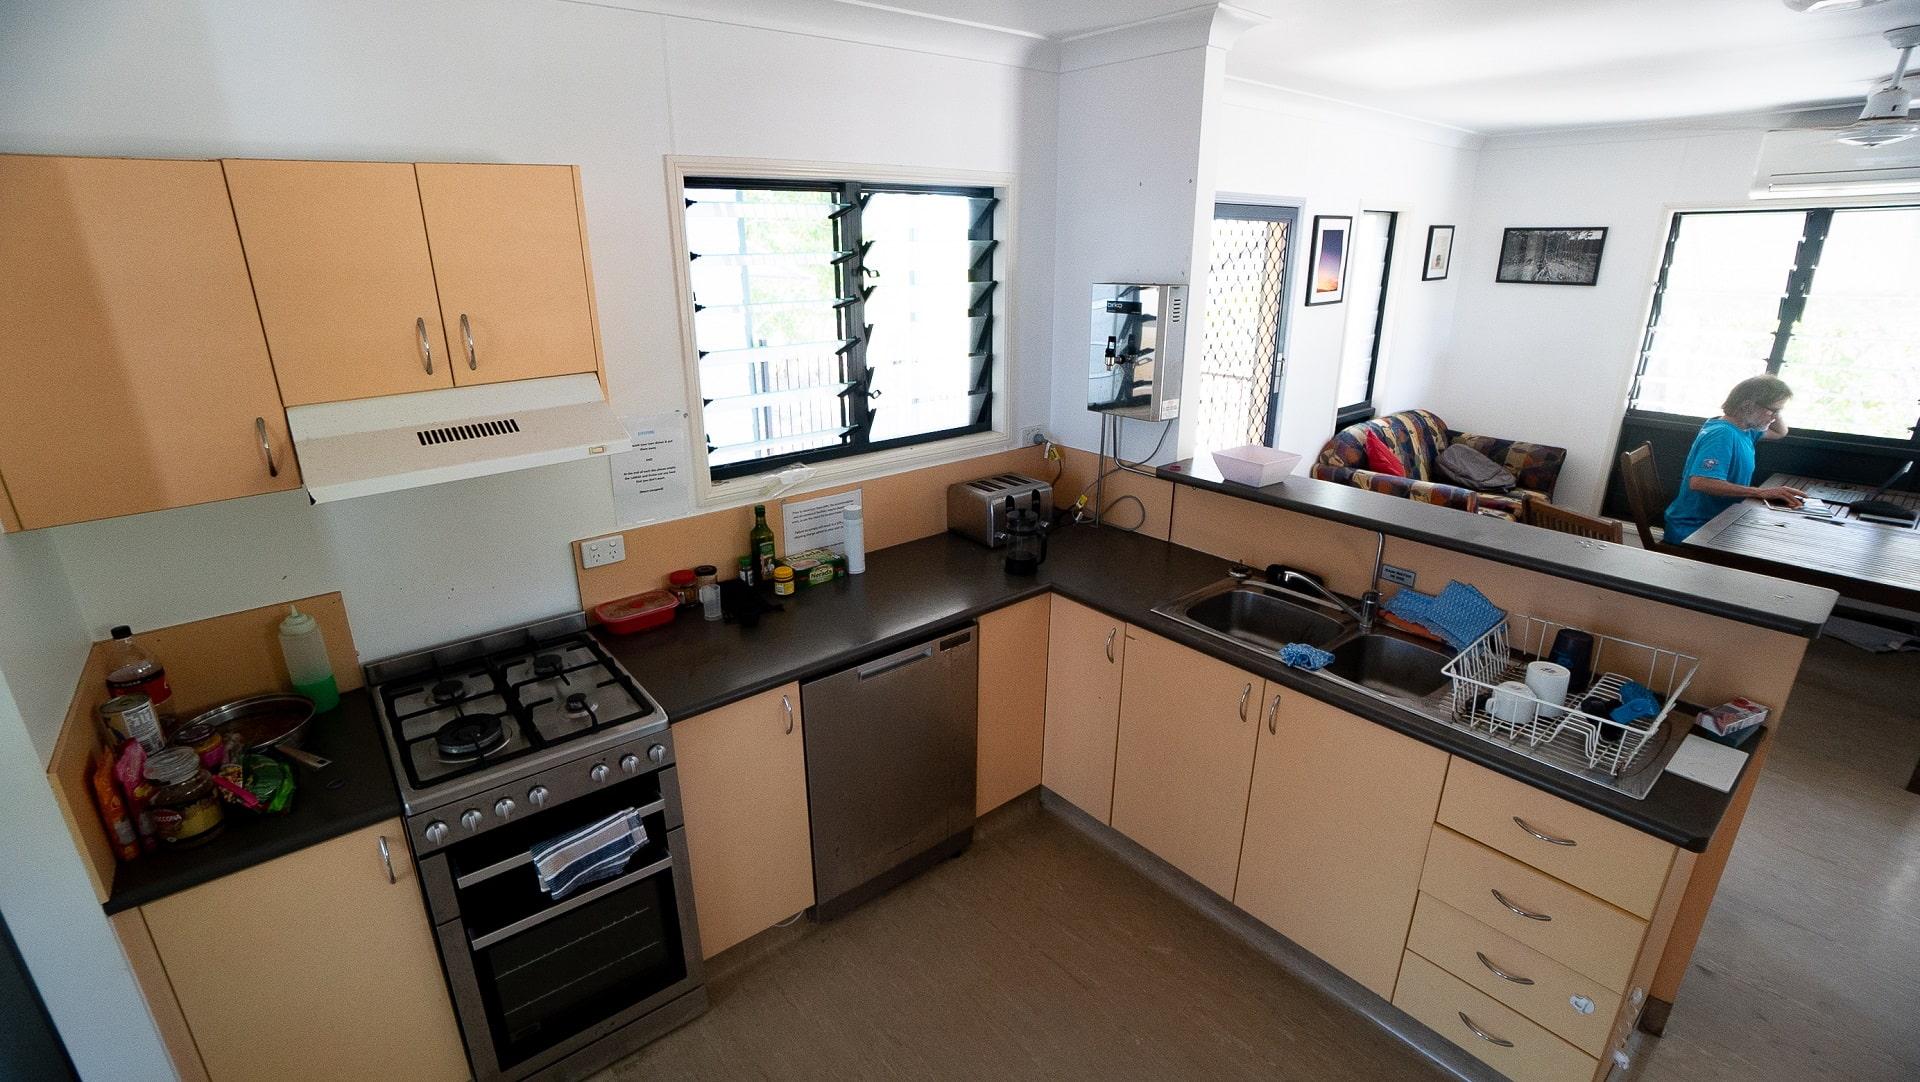 Pelorus kitchen.